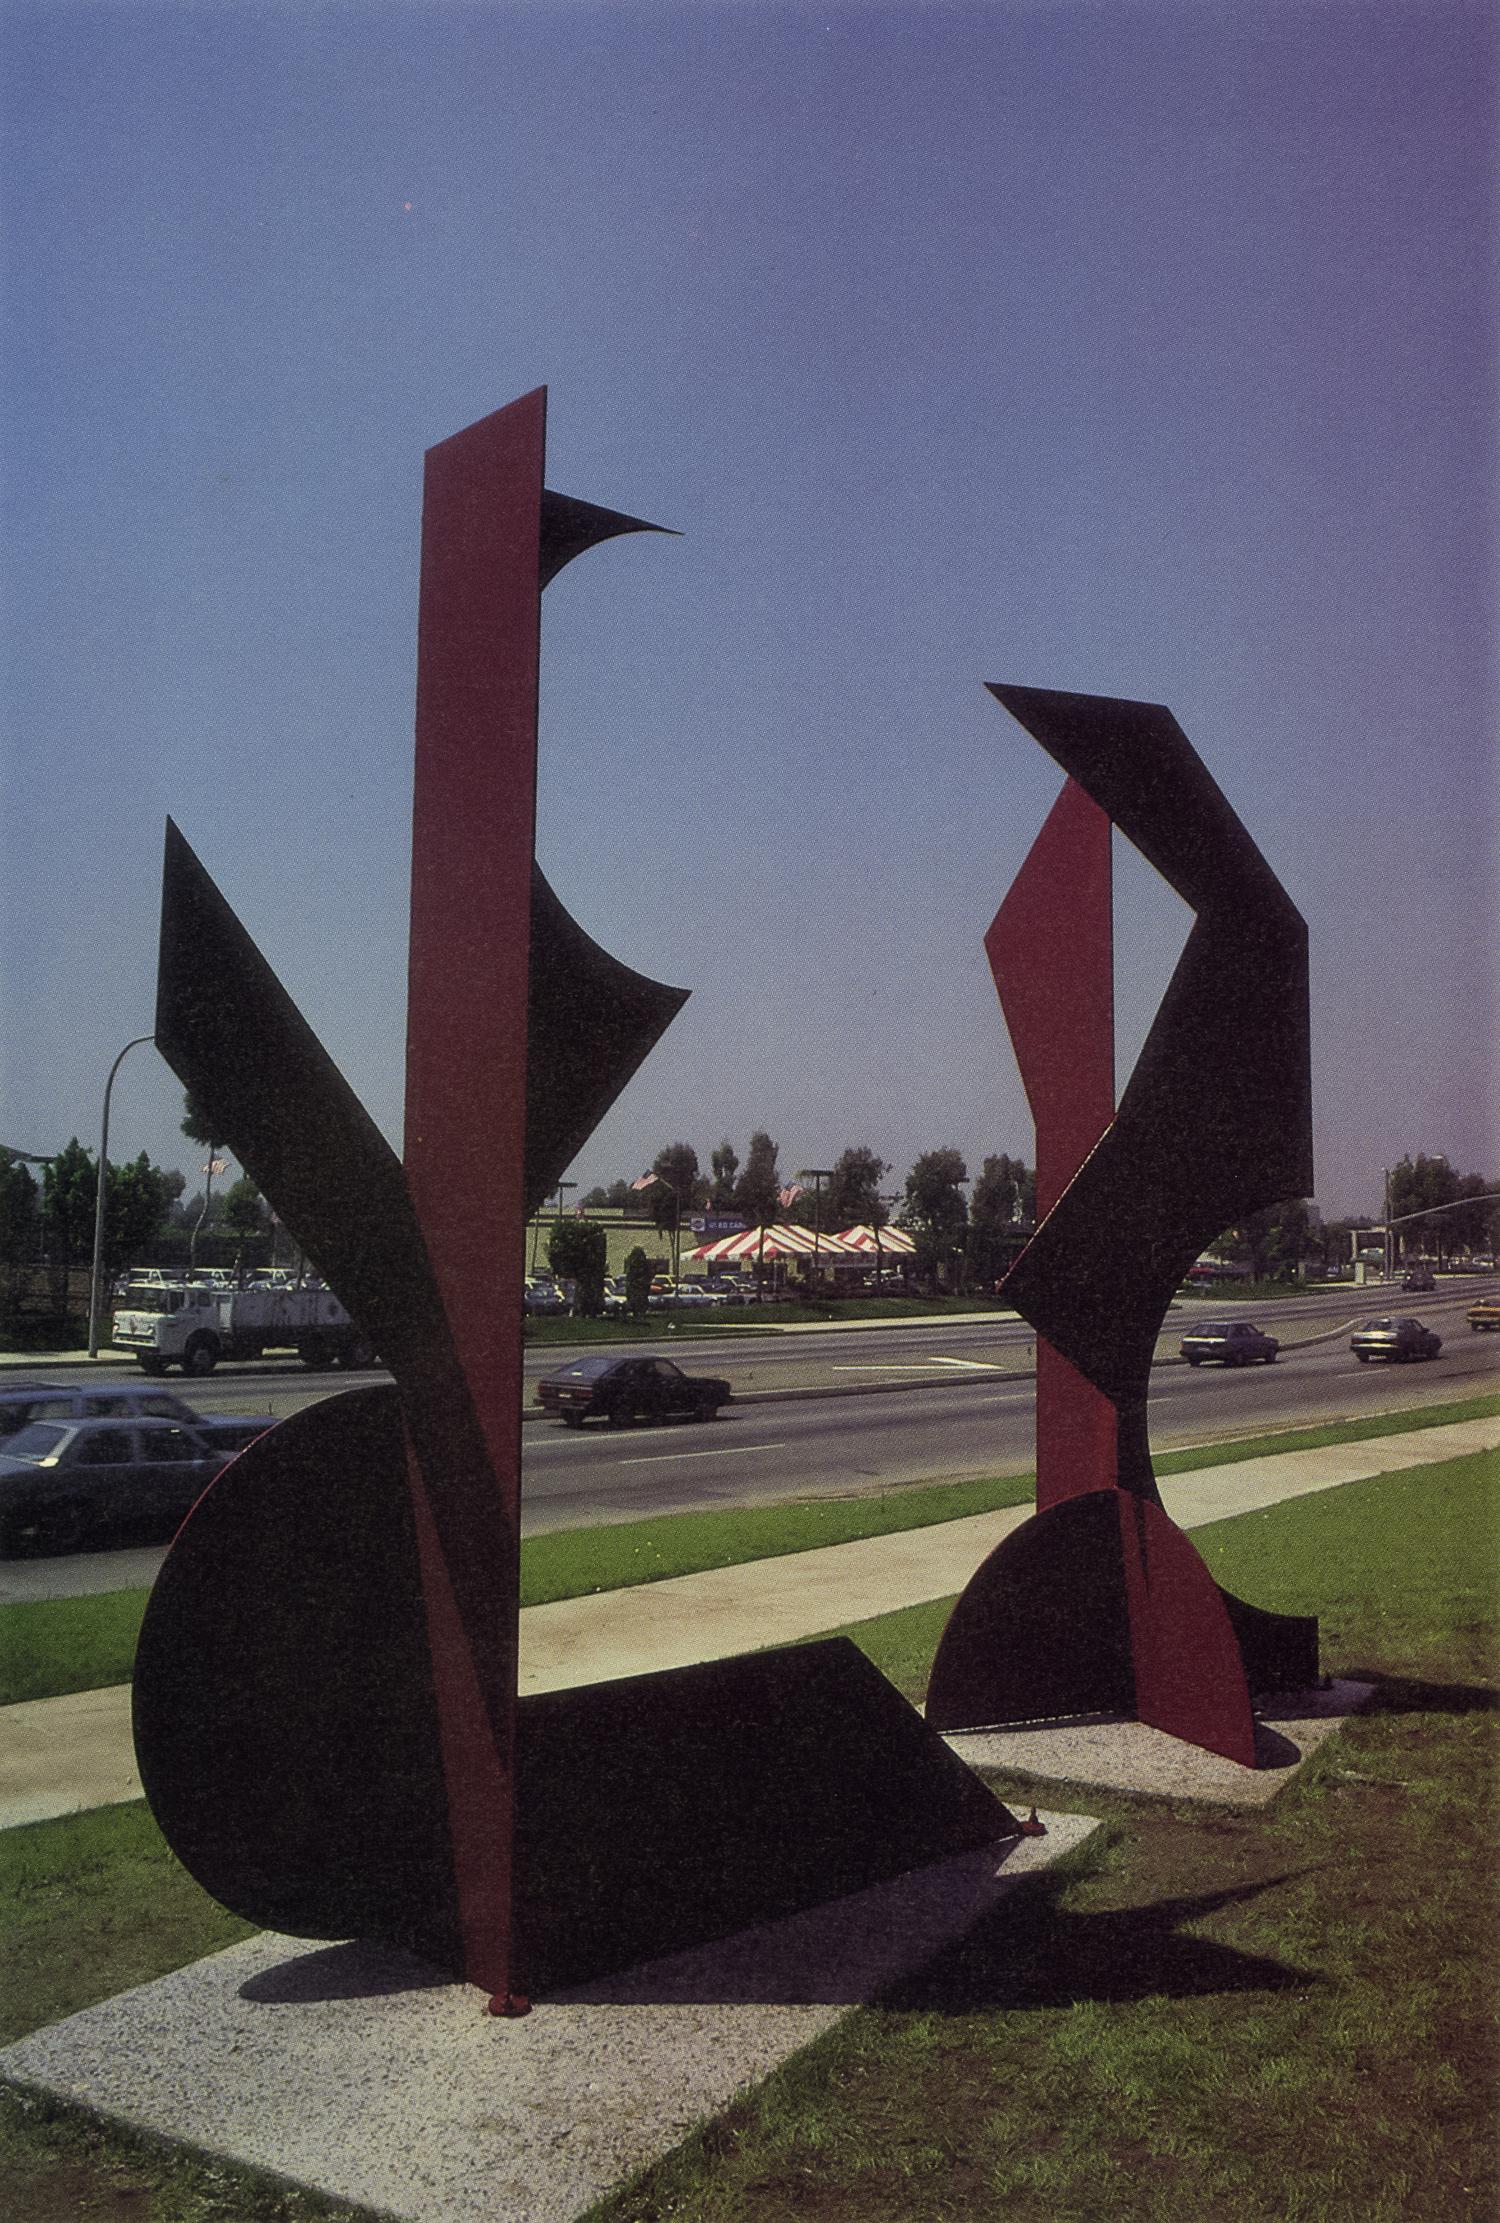 Brea Tech Center, Brea, California; 1987.  Kaikoo IV and XVI.  10.5' x 4' x 4.5'